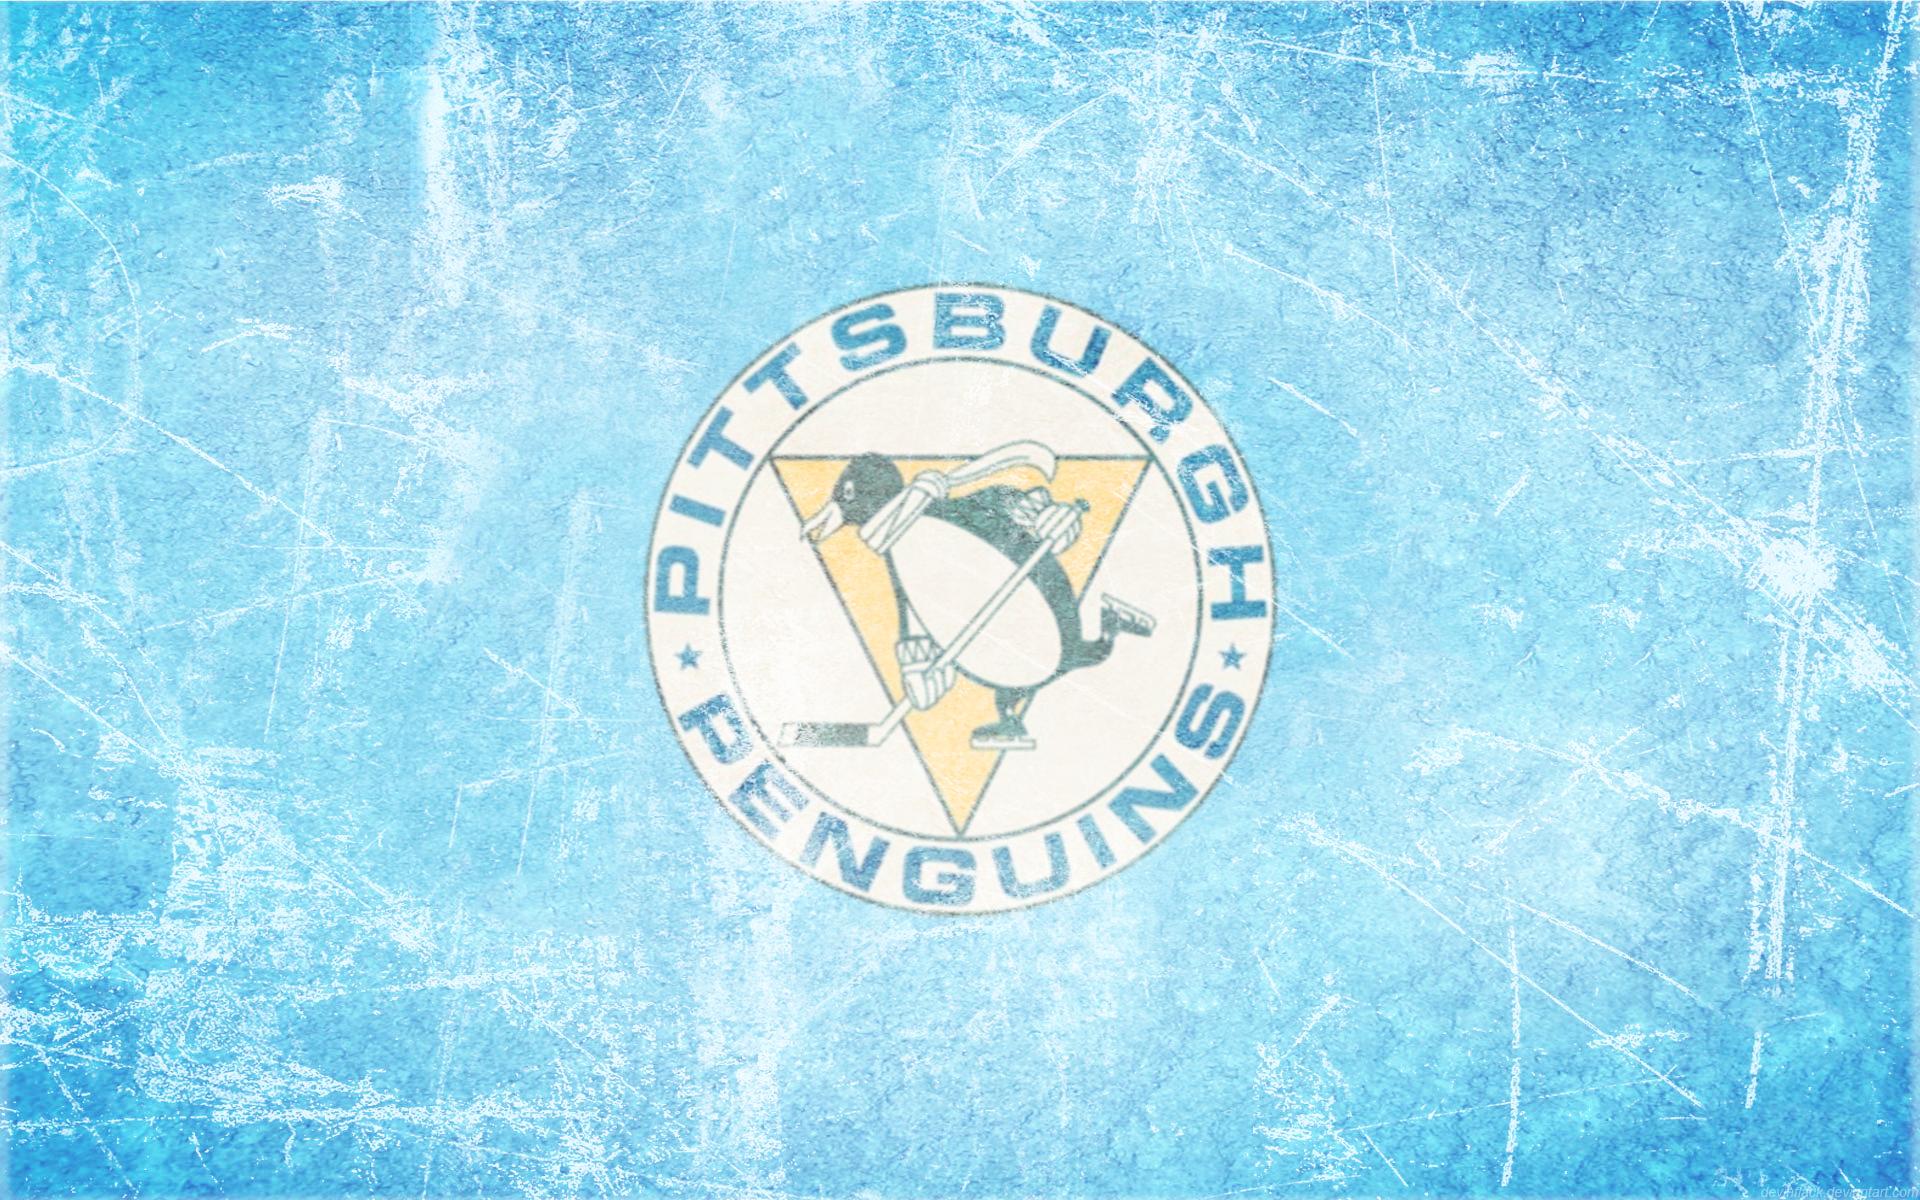 Pittsburgh Penguins Fondo De Pantalla Hd Fondo De